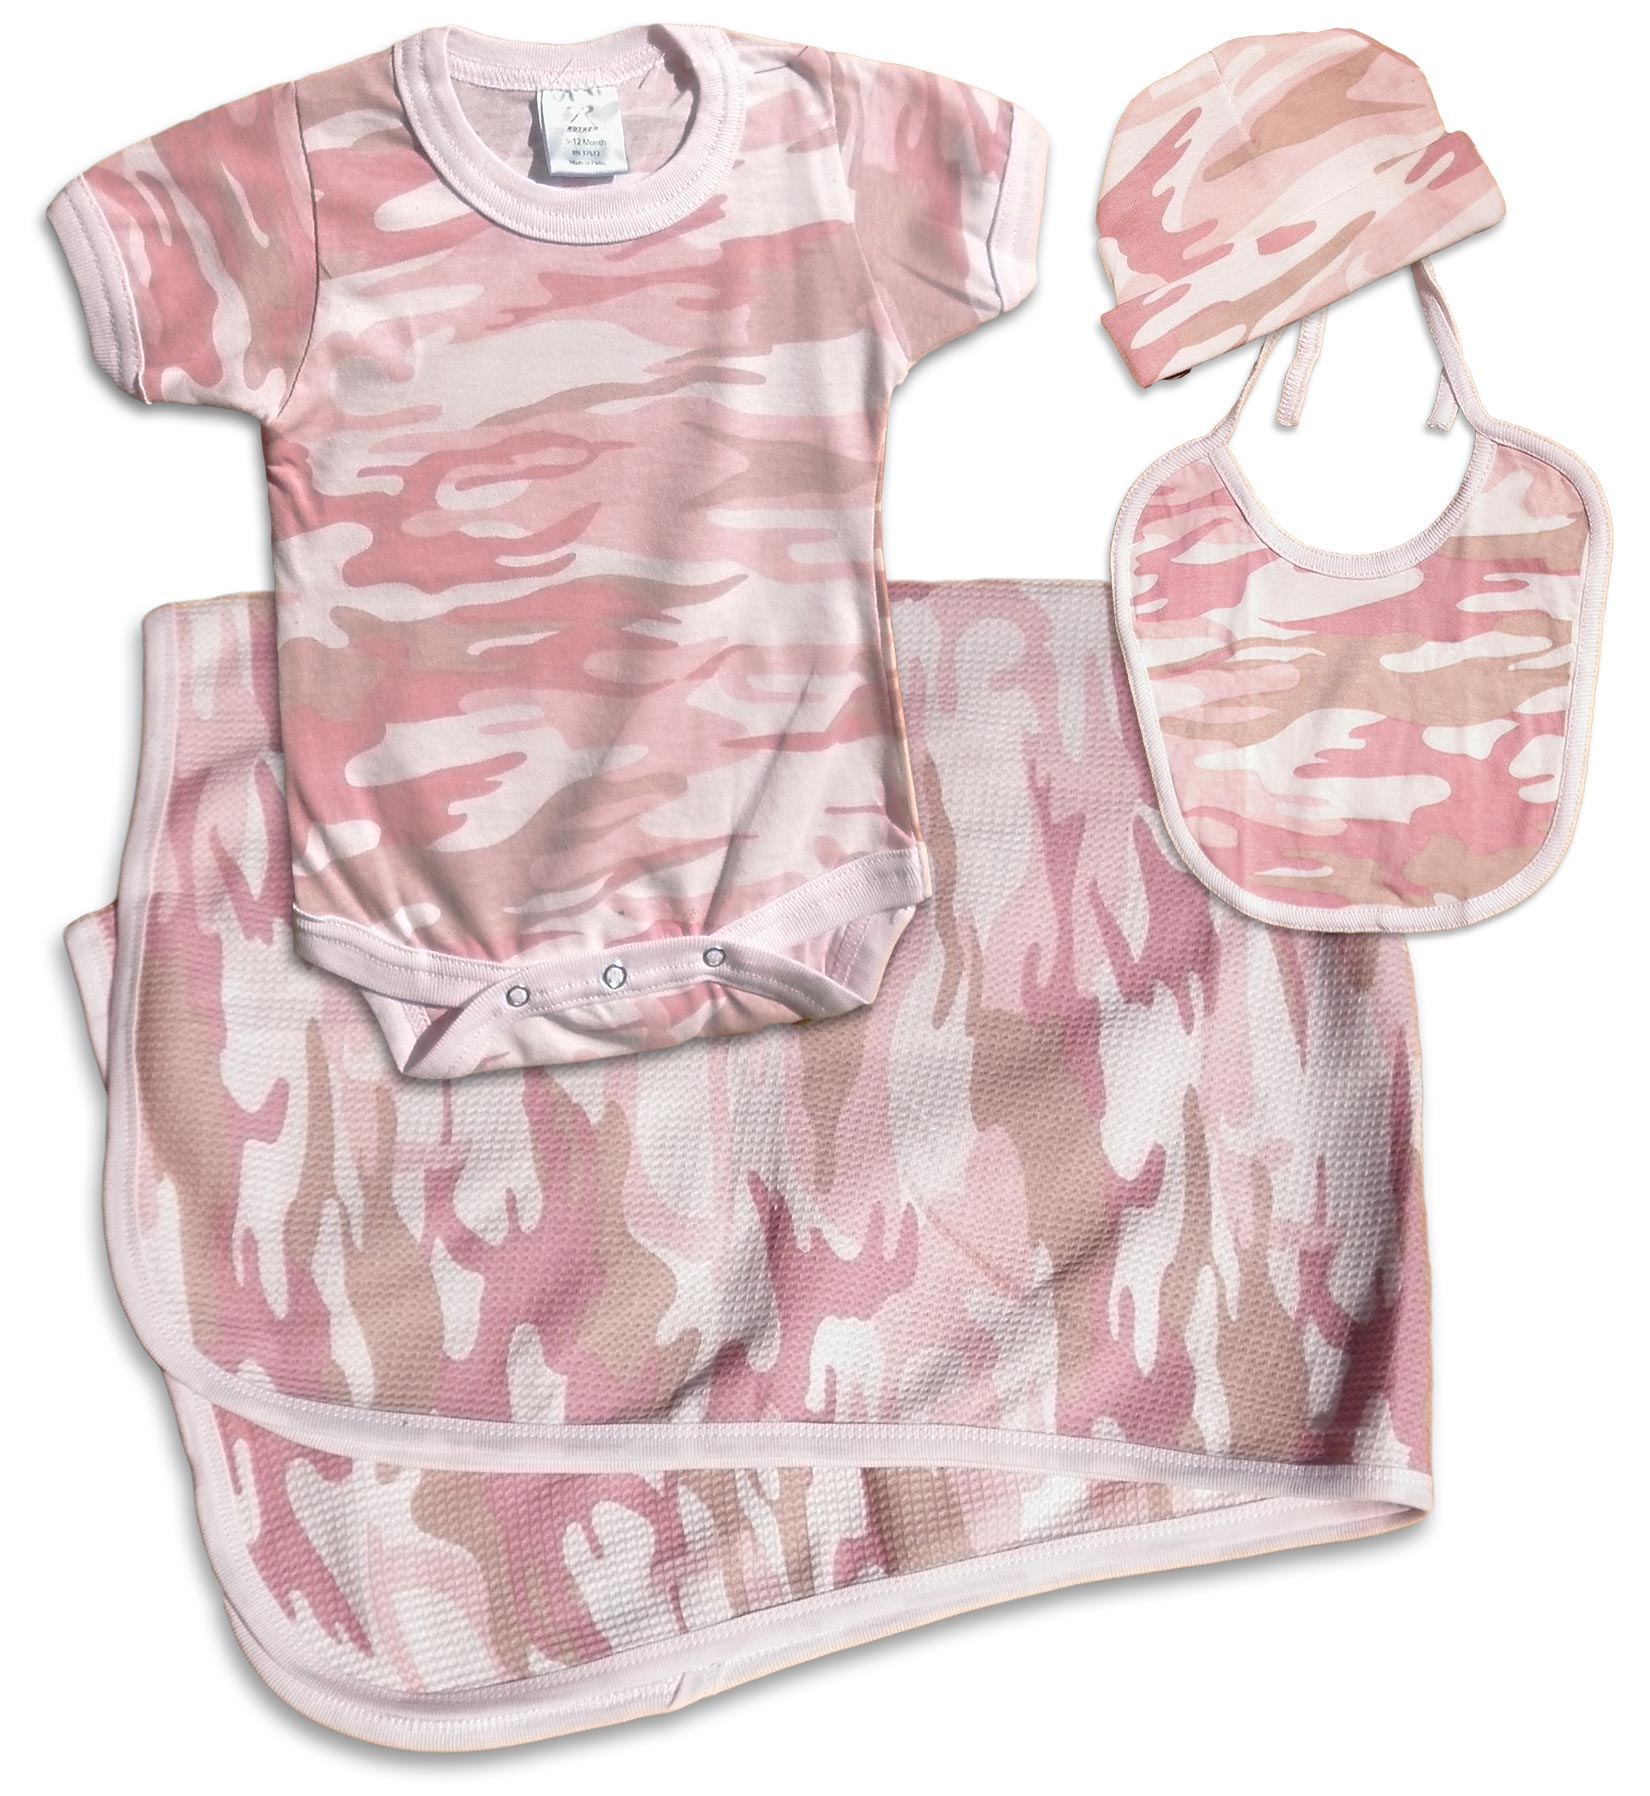 Girls pink camouflage, Camo Baby Gift Pack: Cap, bodysuit (onesie), receiving blanket, bib. For your Duck Dynasty baby.